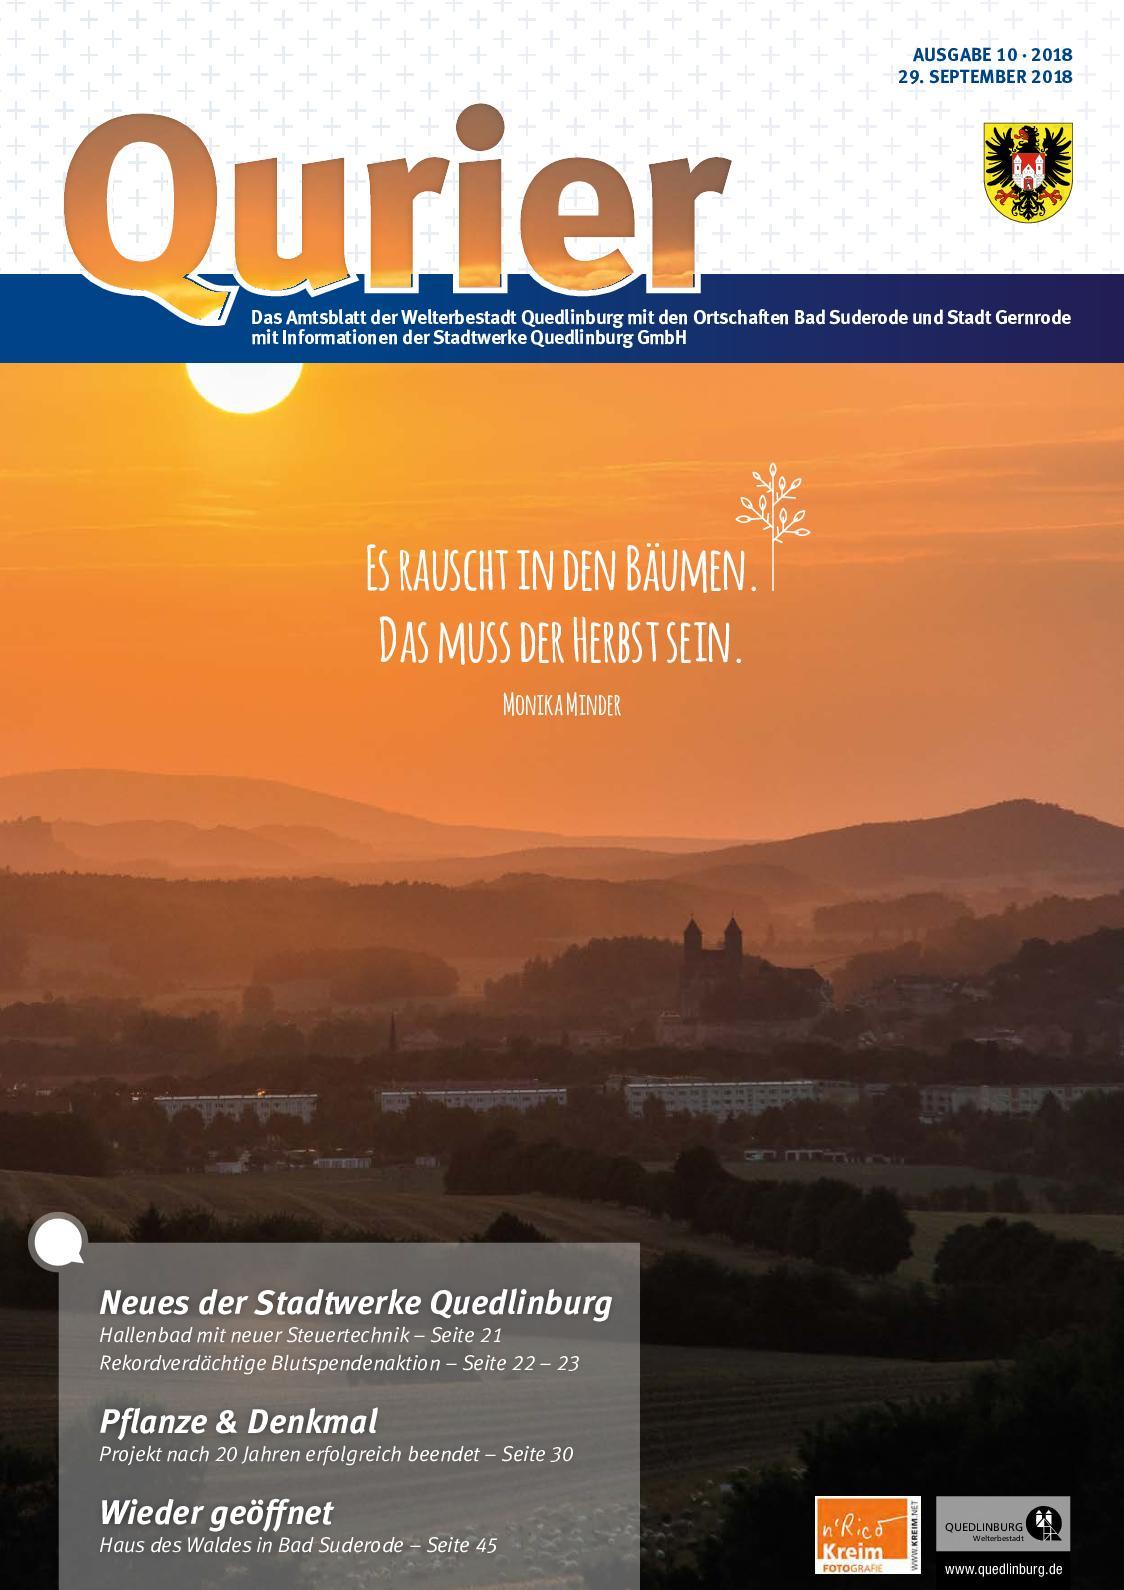 Calameo Qurier 10 2018 Vom 29 08 2018 Das Amtsblatt Der